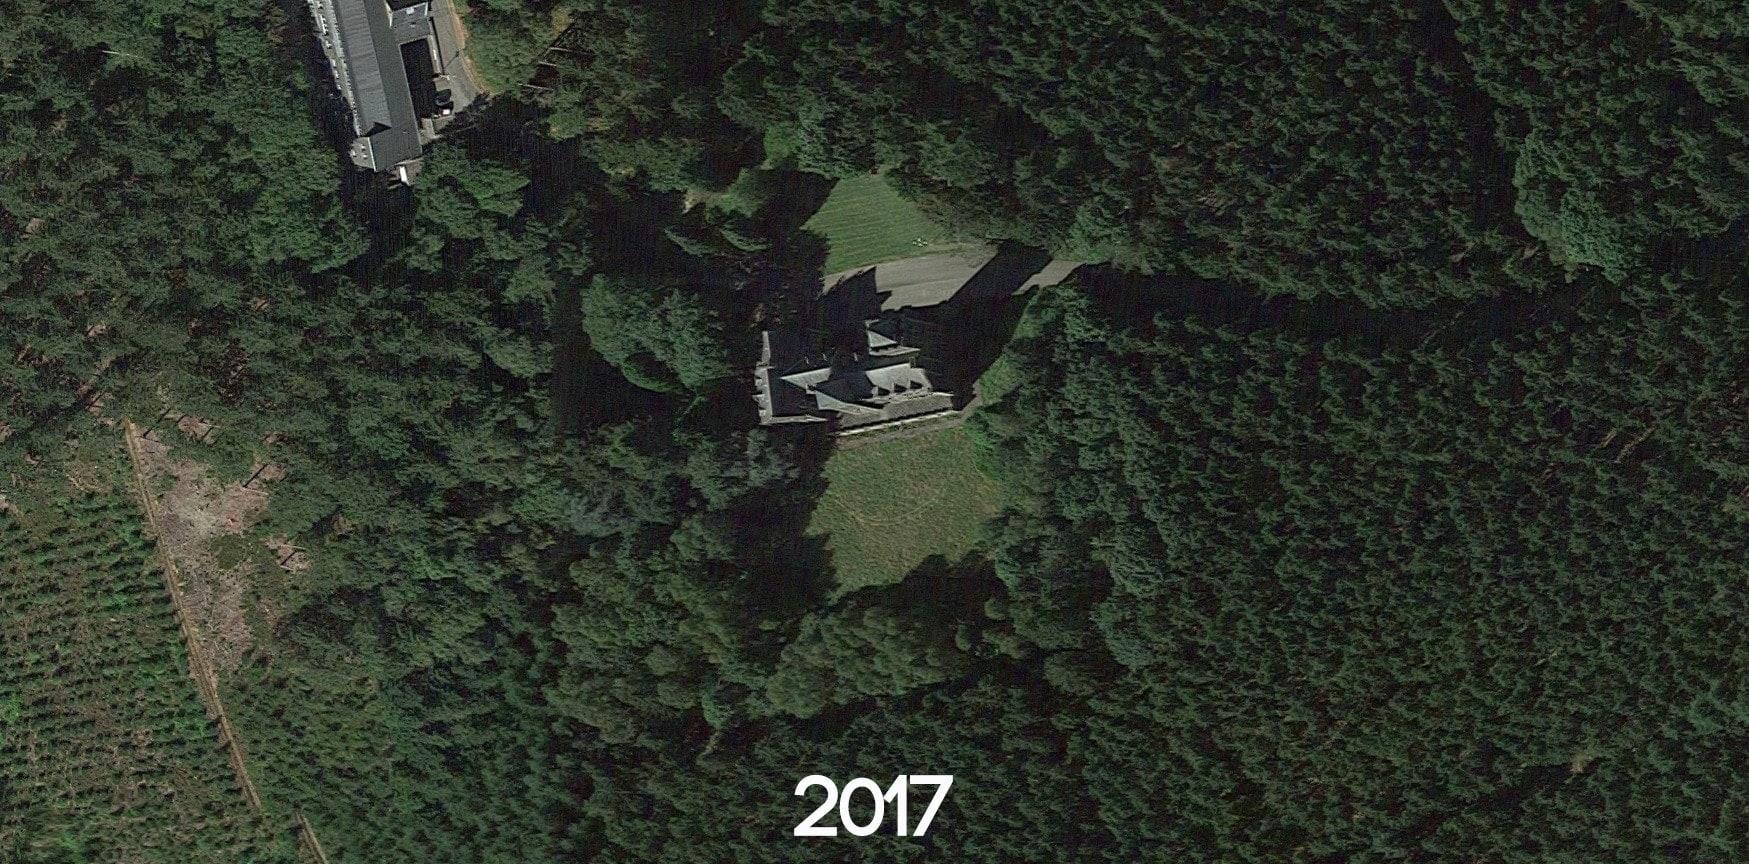 chateau-martha-marek-map-2017